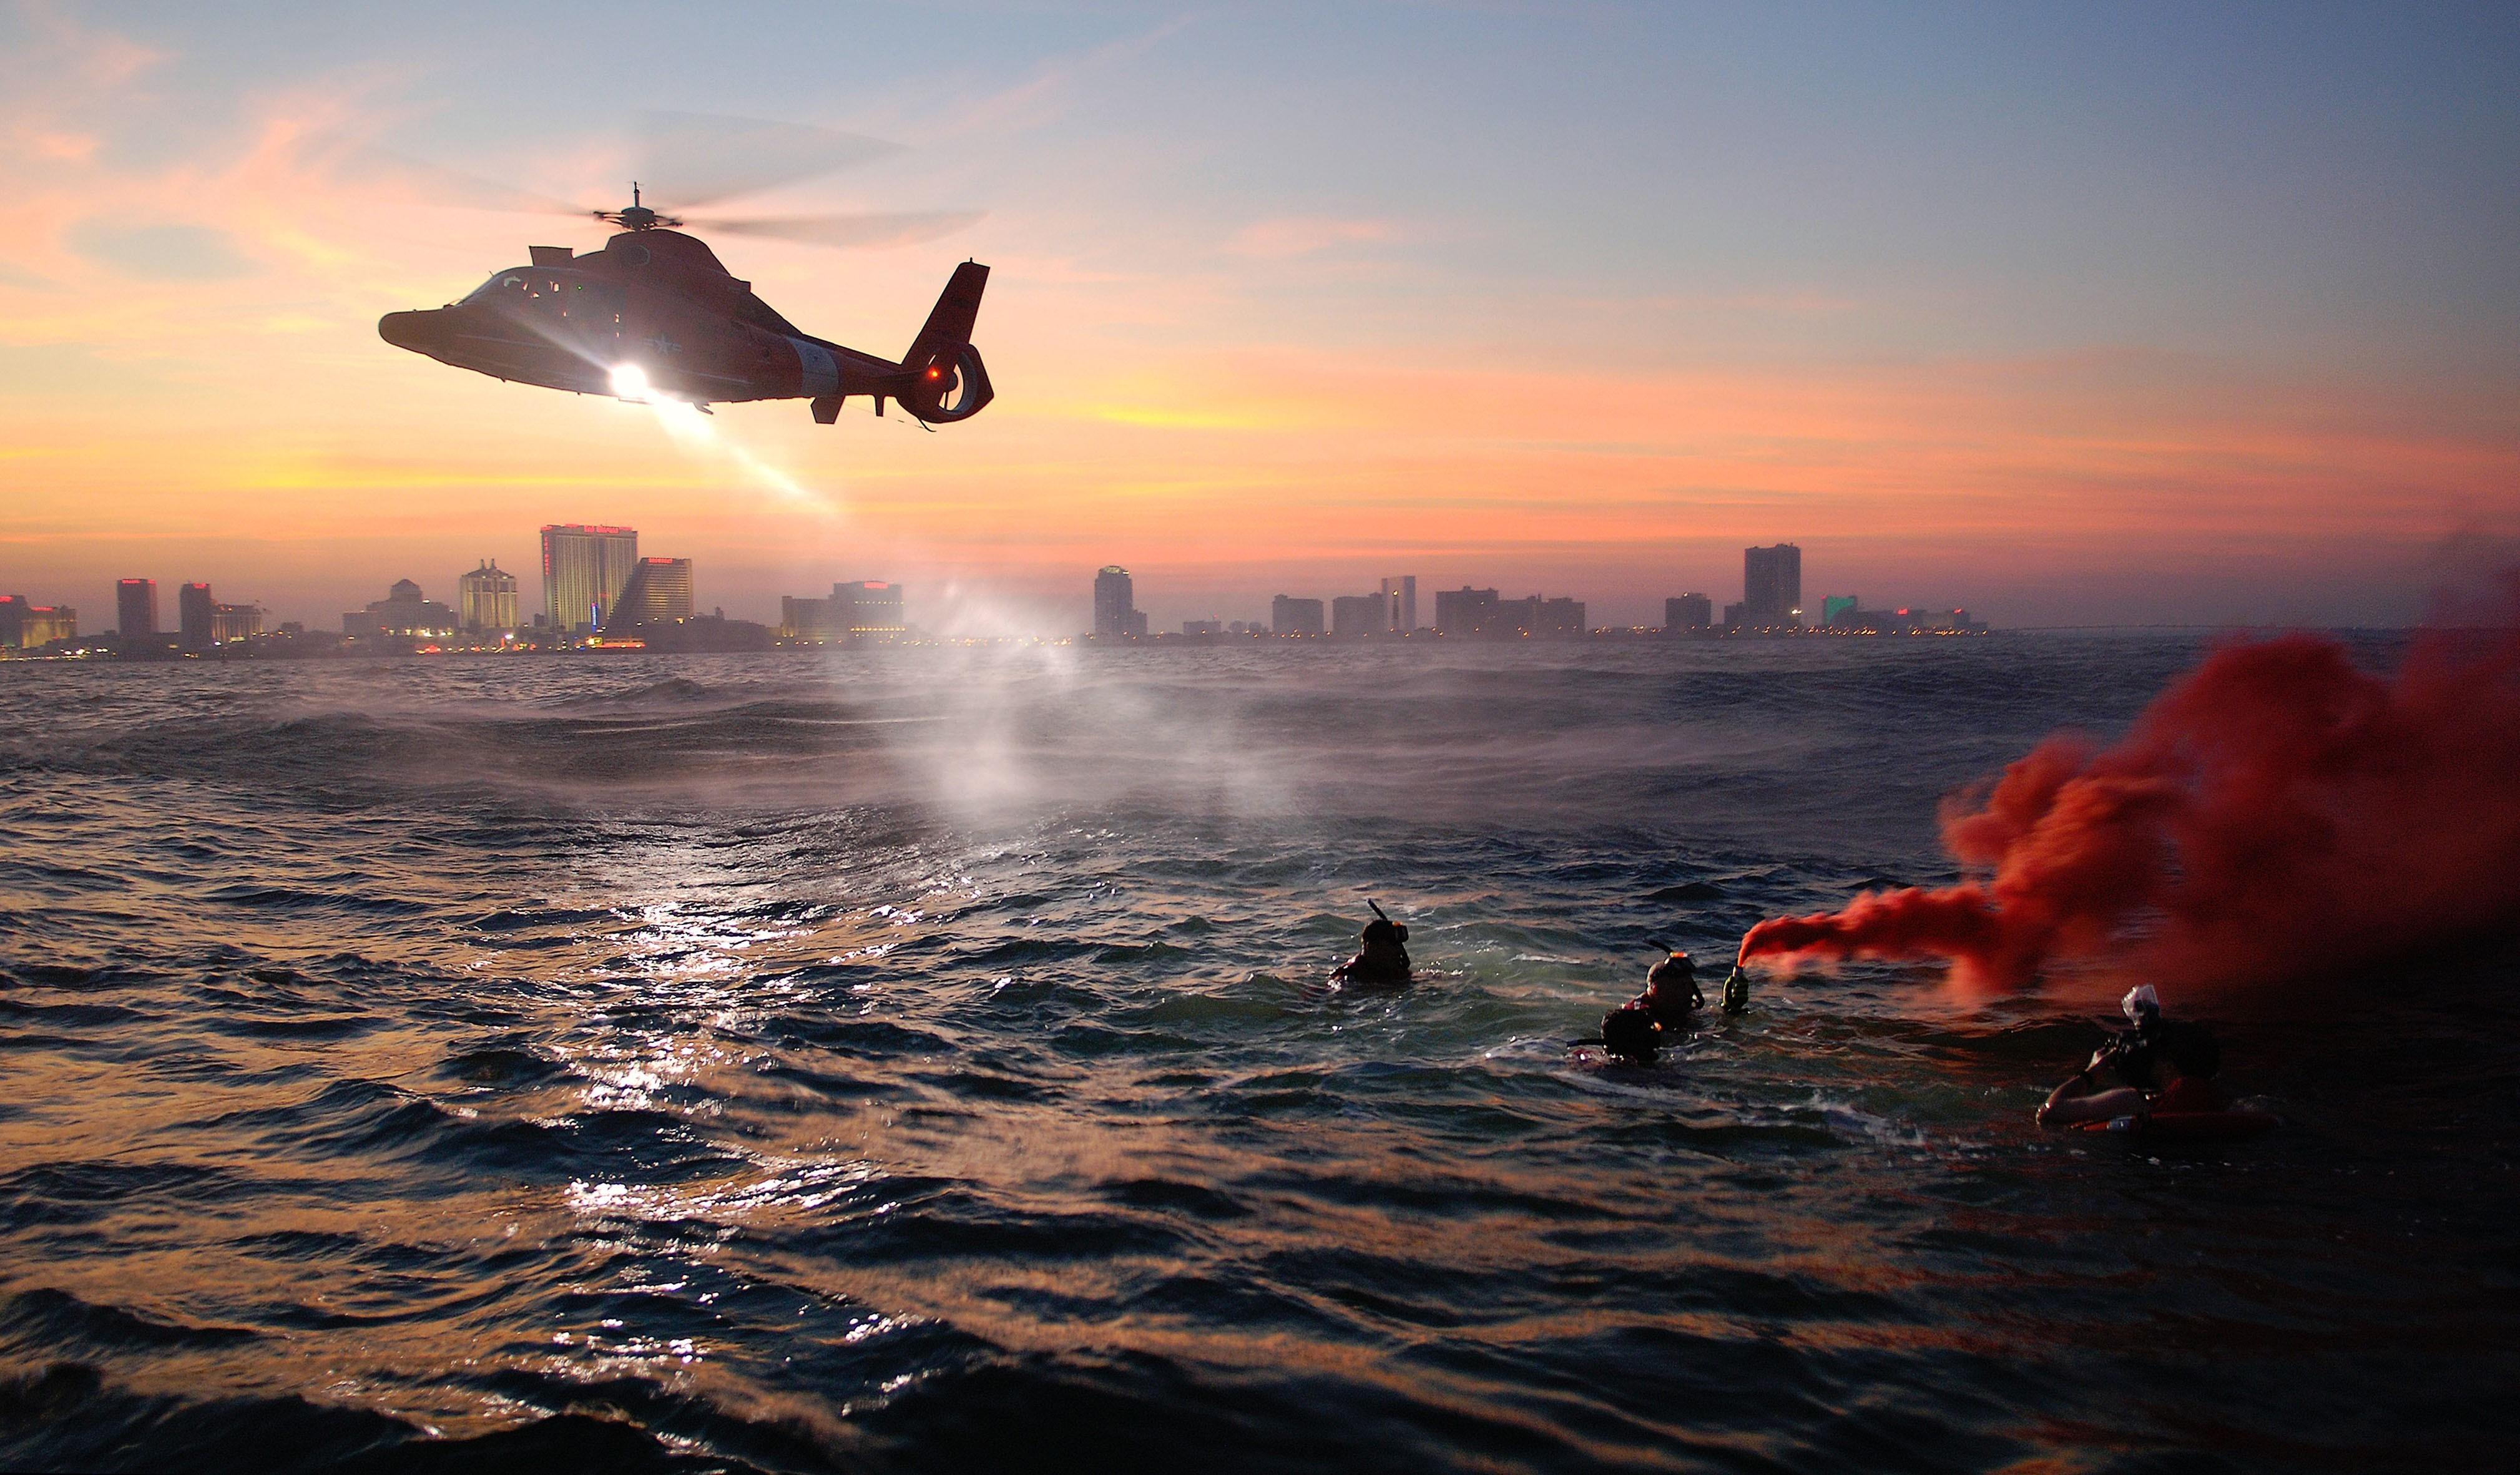 wallpaper coast guard rescue medevac rescue helicopter